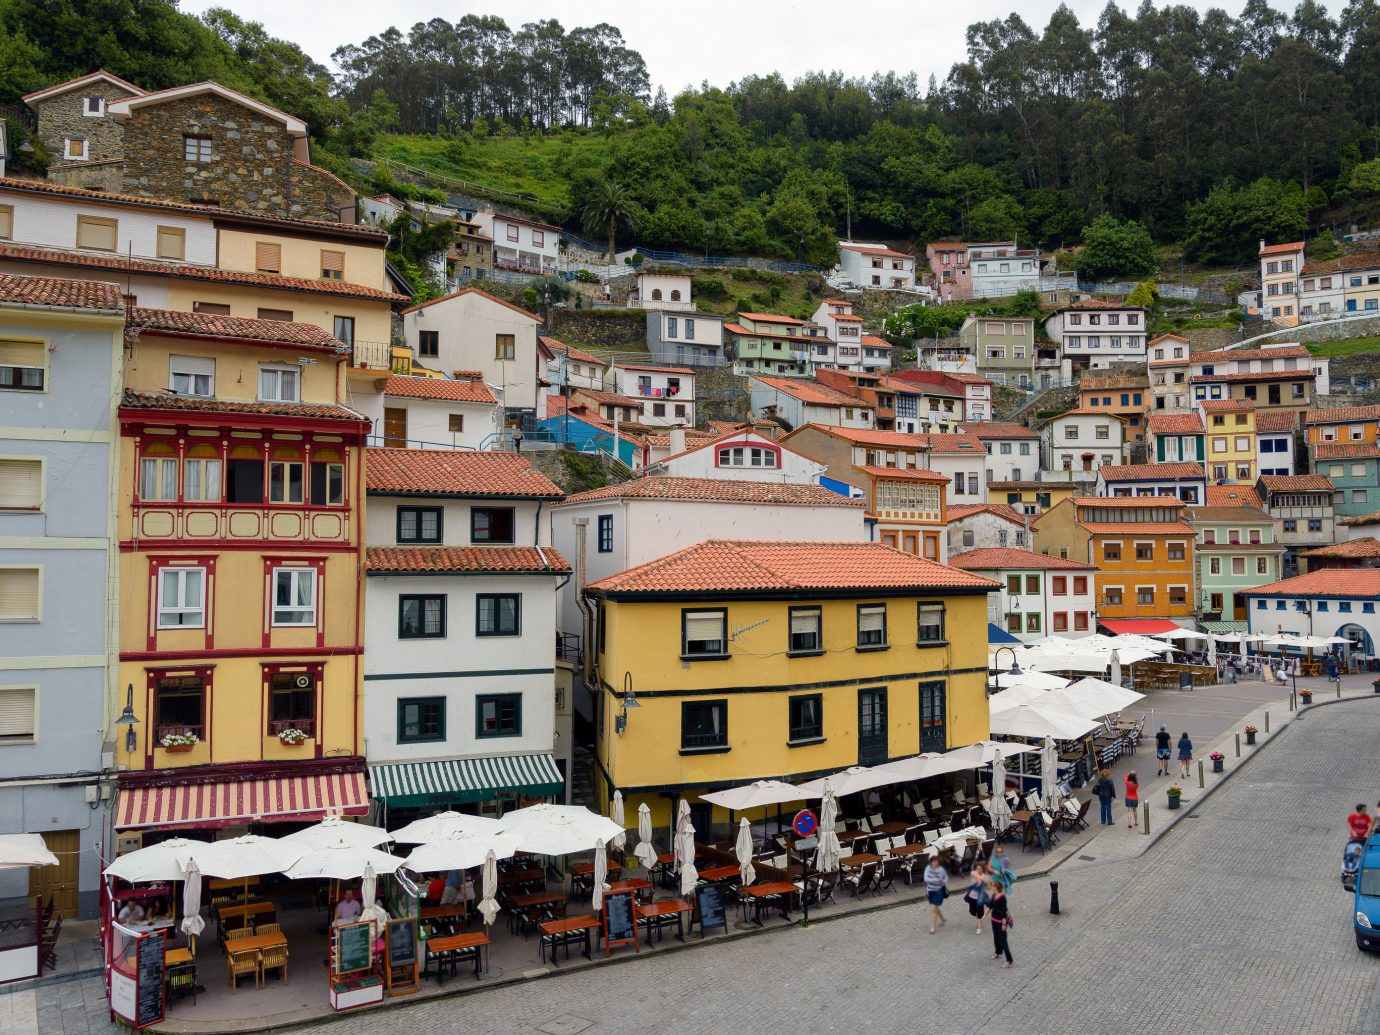 Trip Ideas Town City neighbourhood street tourism sky building house marketplace